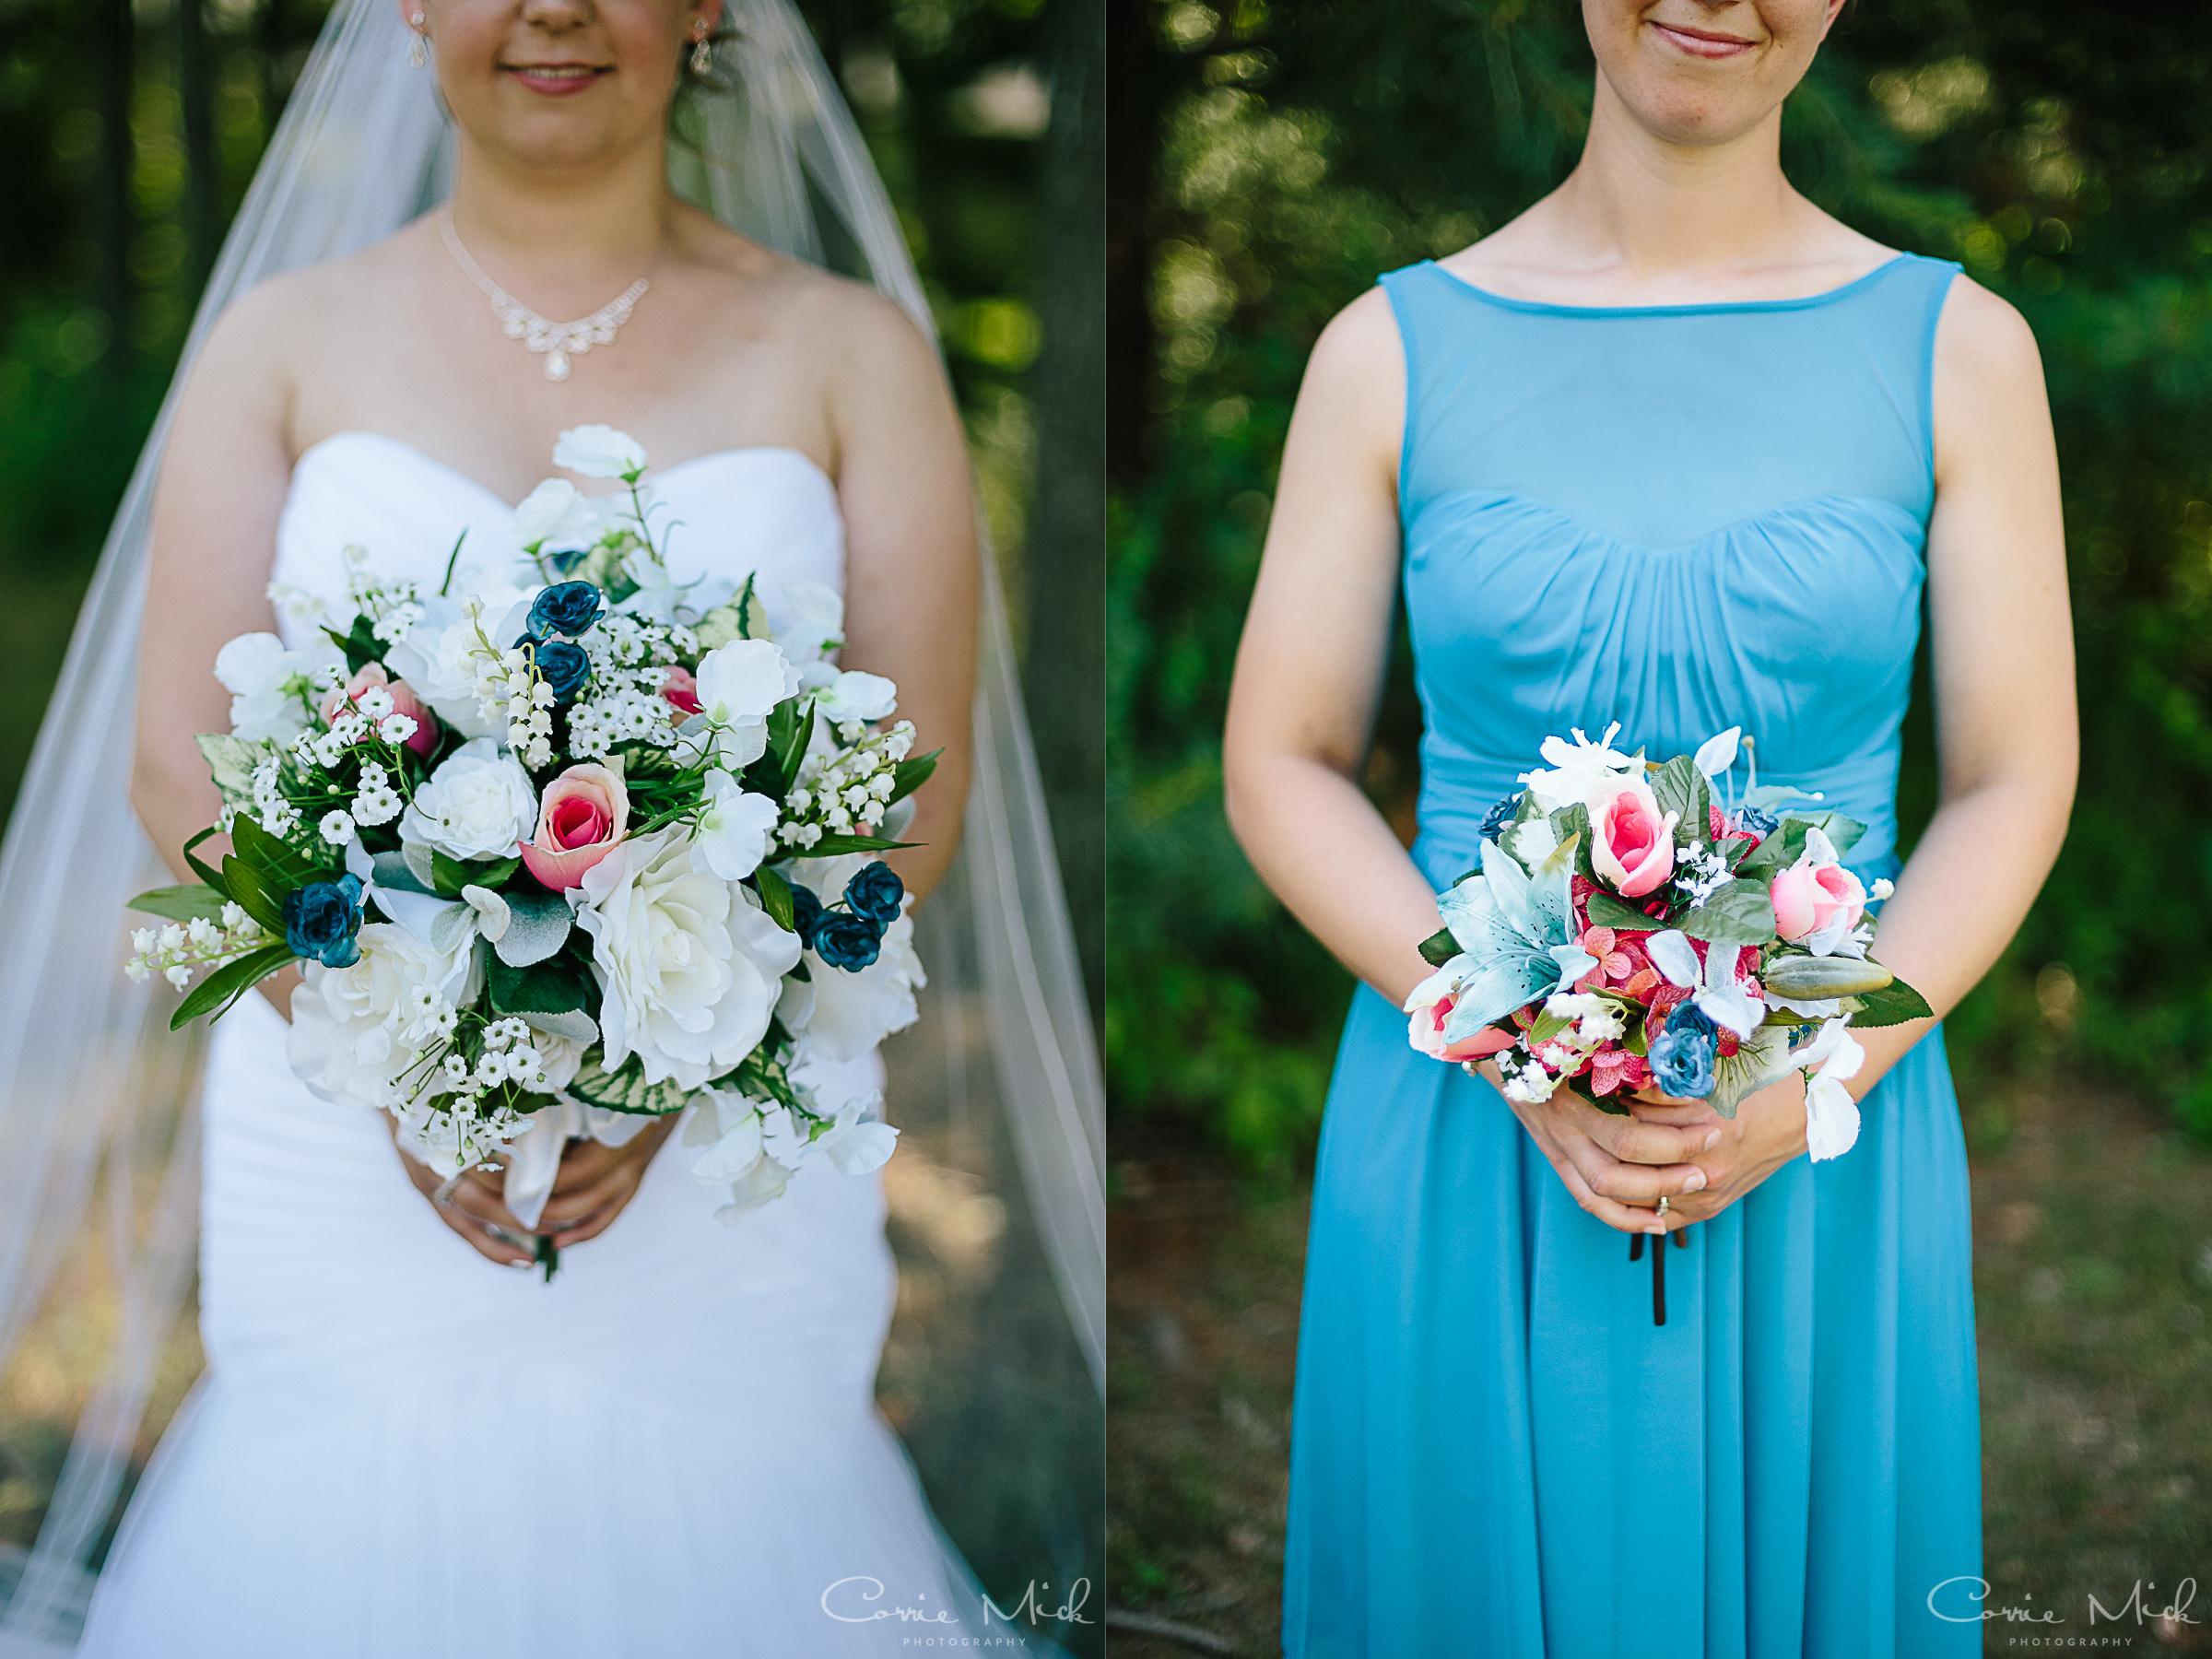 Wedding Flowers - Corrie Mick Photography.jpg